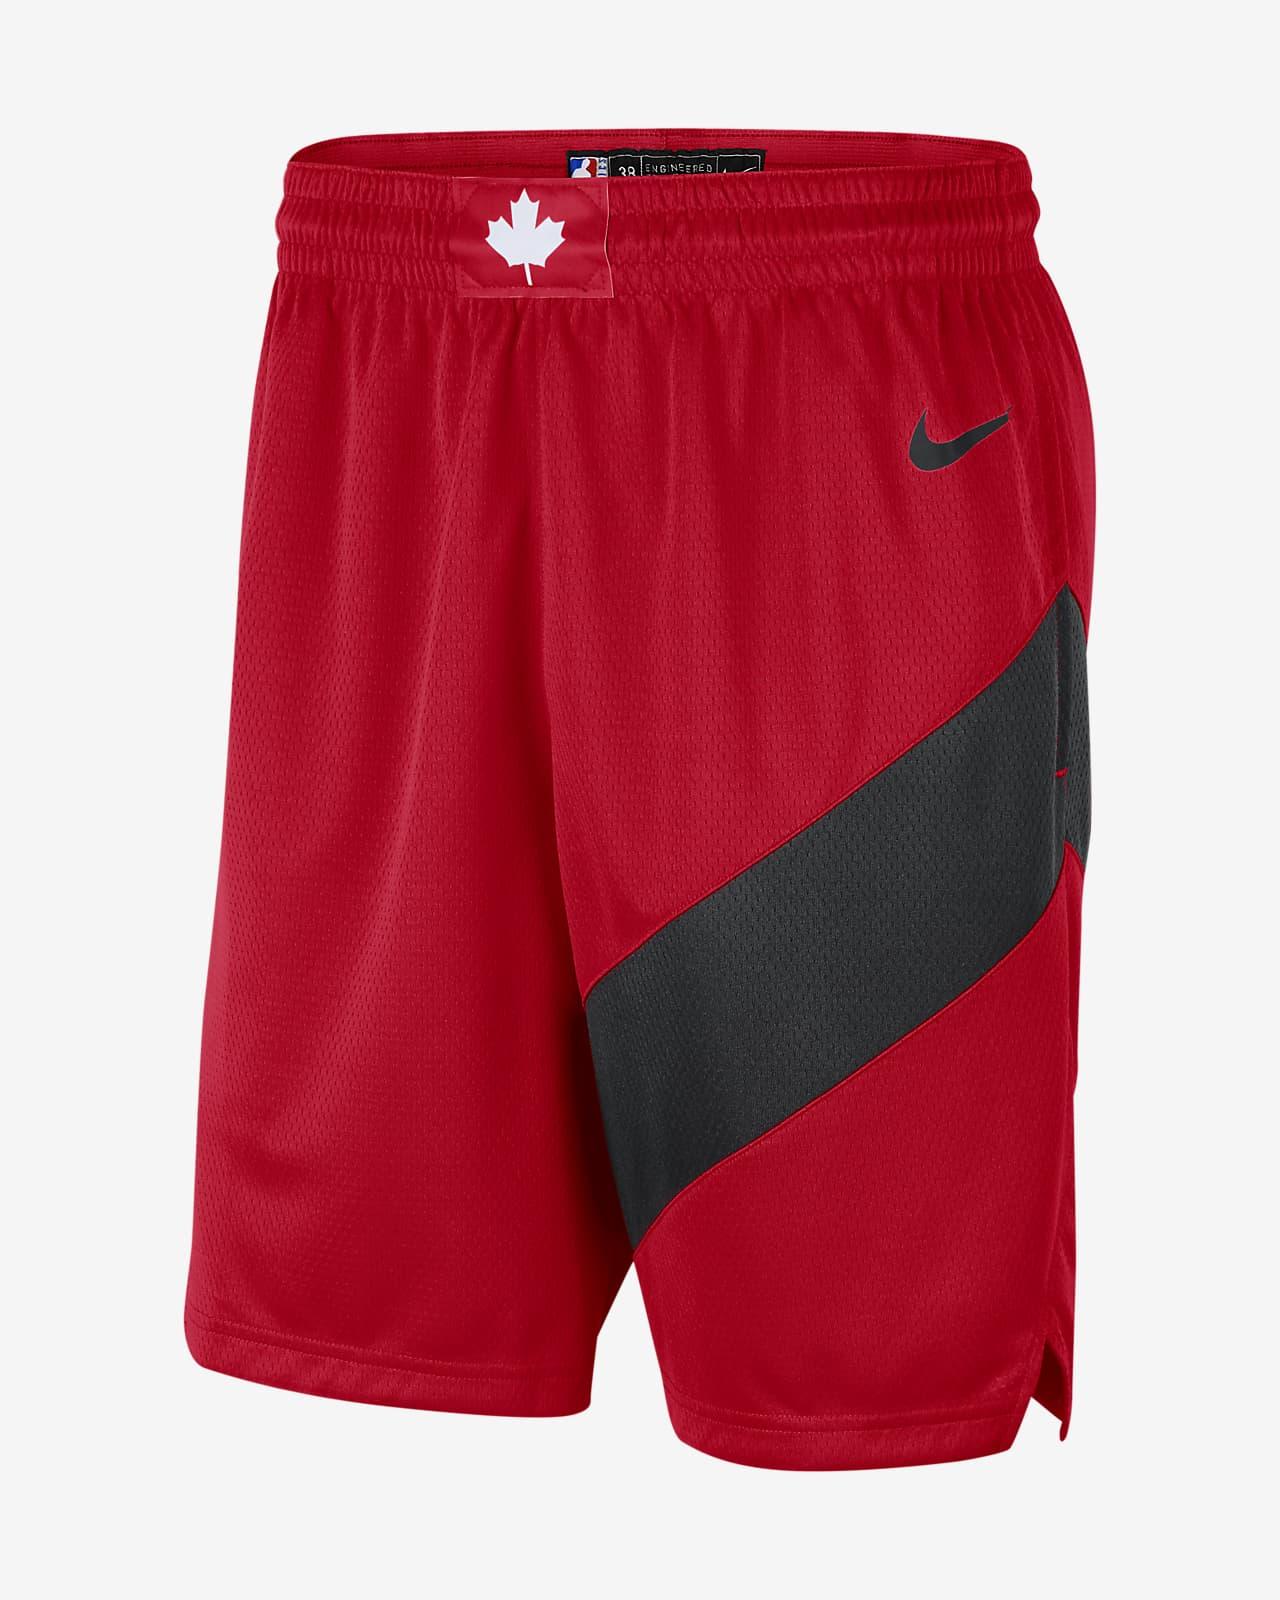 Short Nike NBA Swingman Toronto Raptors Icon Edition 2020 pour Homme